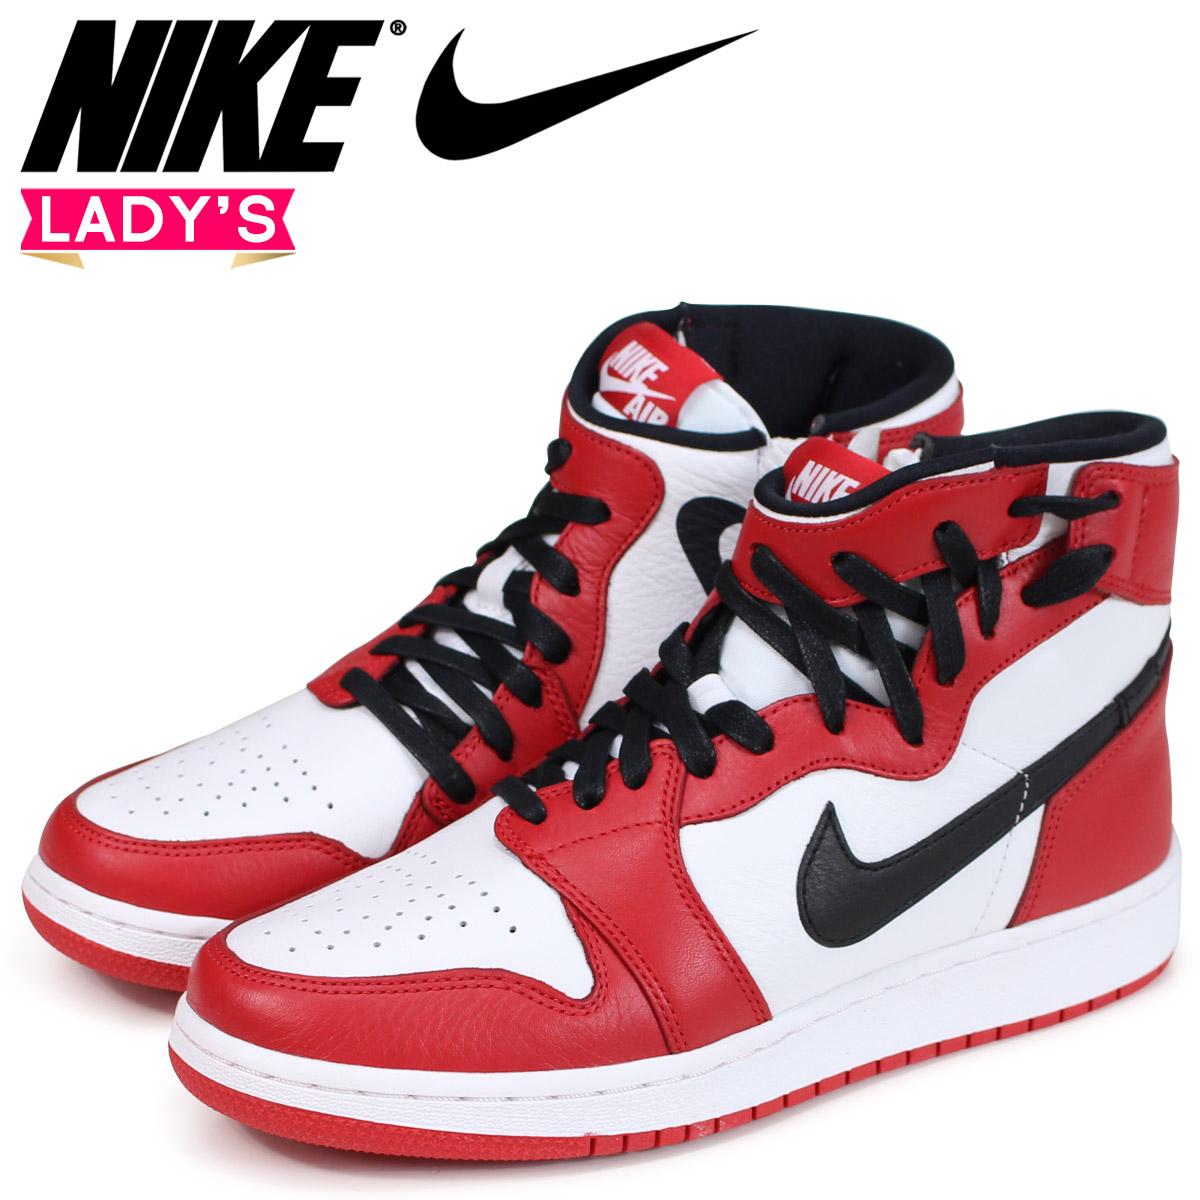 abab57b9d98 NIKE Nike Air Jordan 1 nostalgic lady s sneakers WMNS AIR JORDAN 1 REBEL XX  OG AT4151-100 white  load planned Shinnyu load in reservation product 6 29  ...